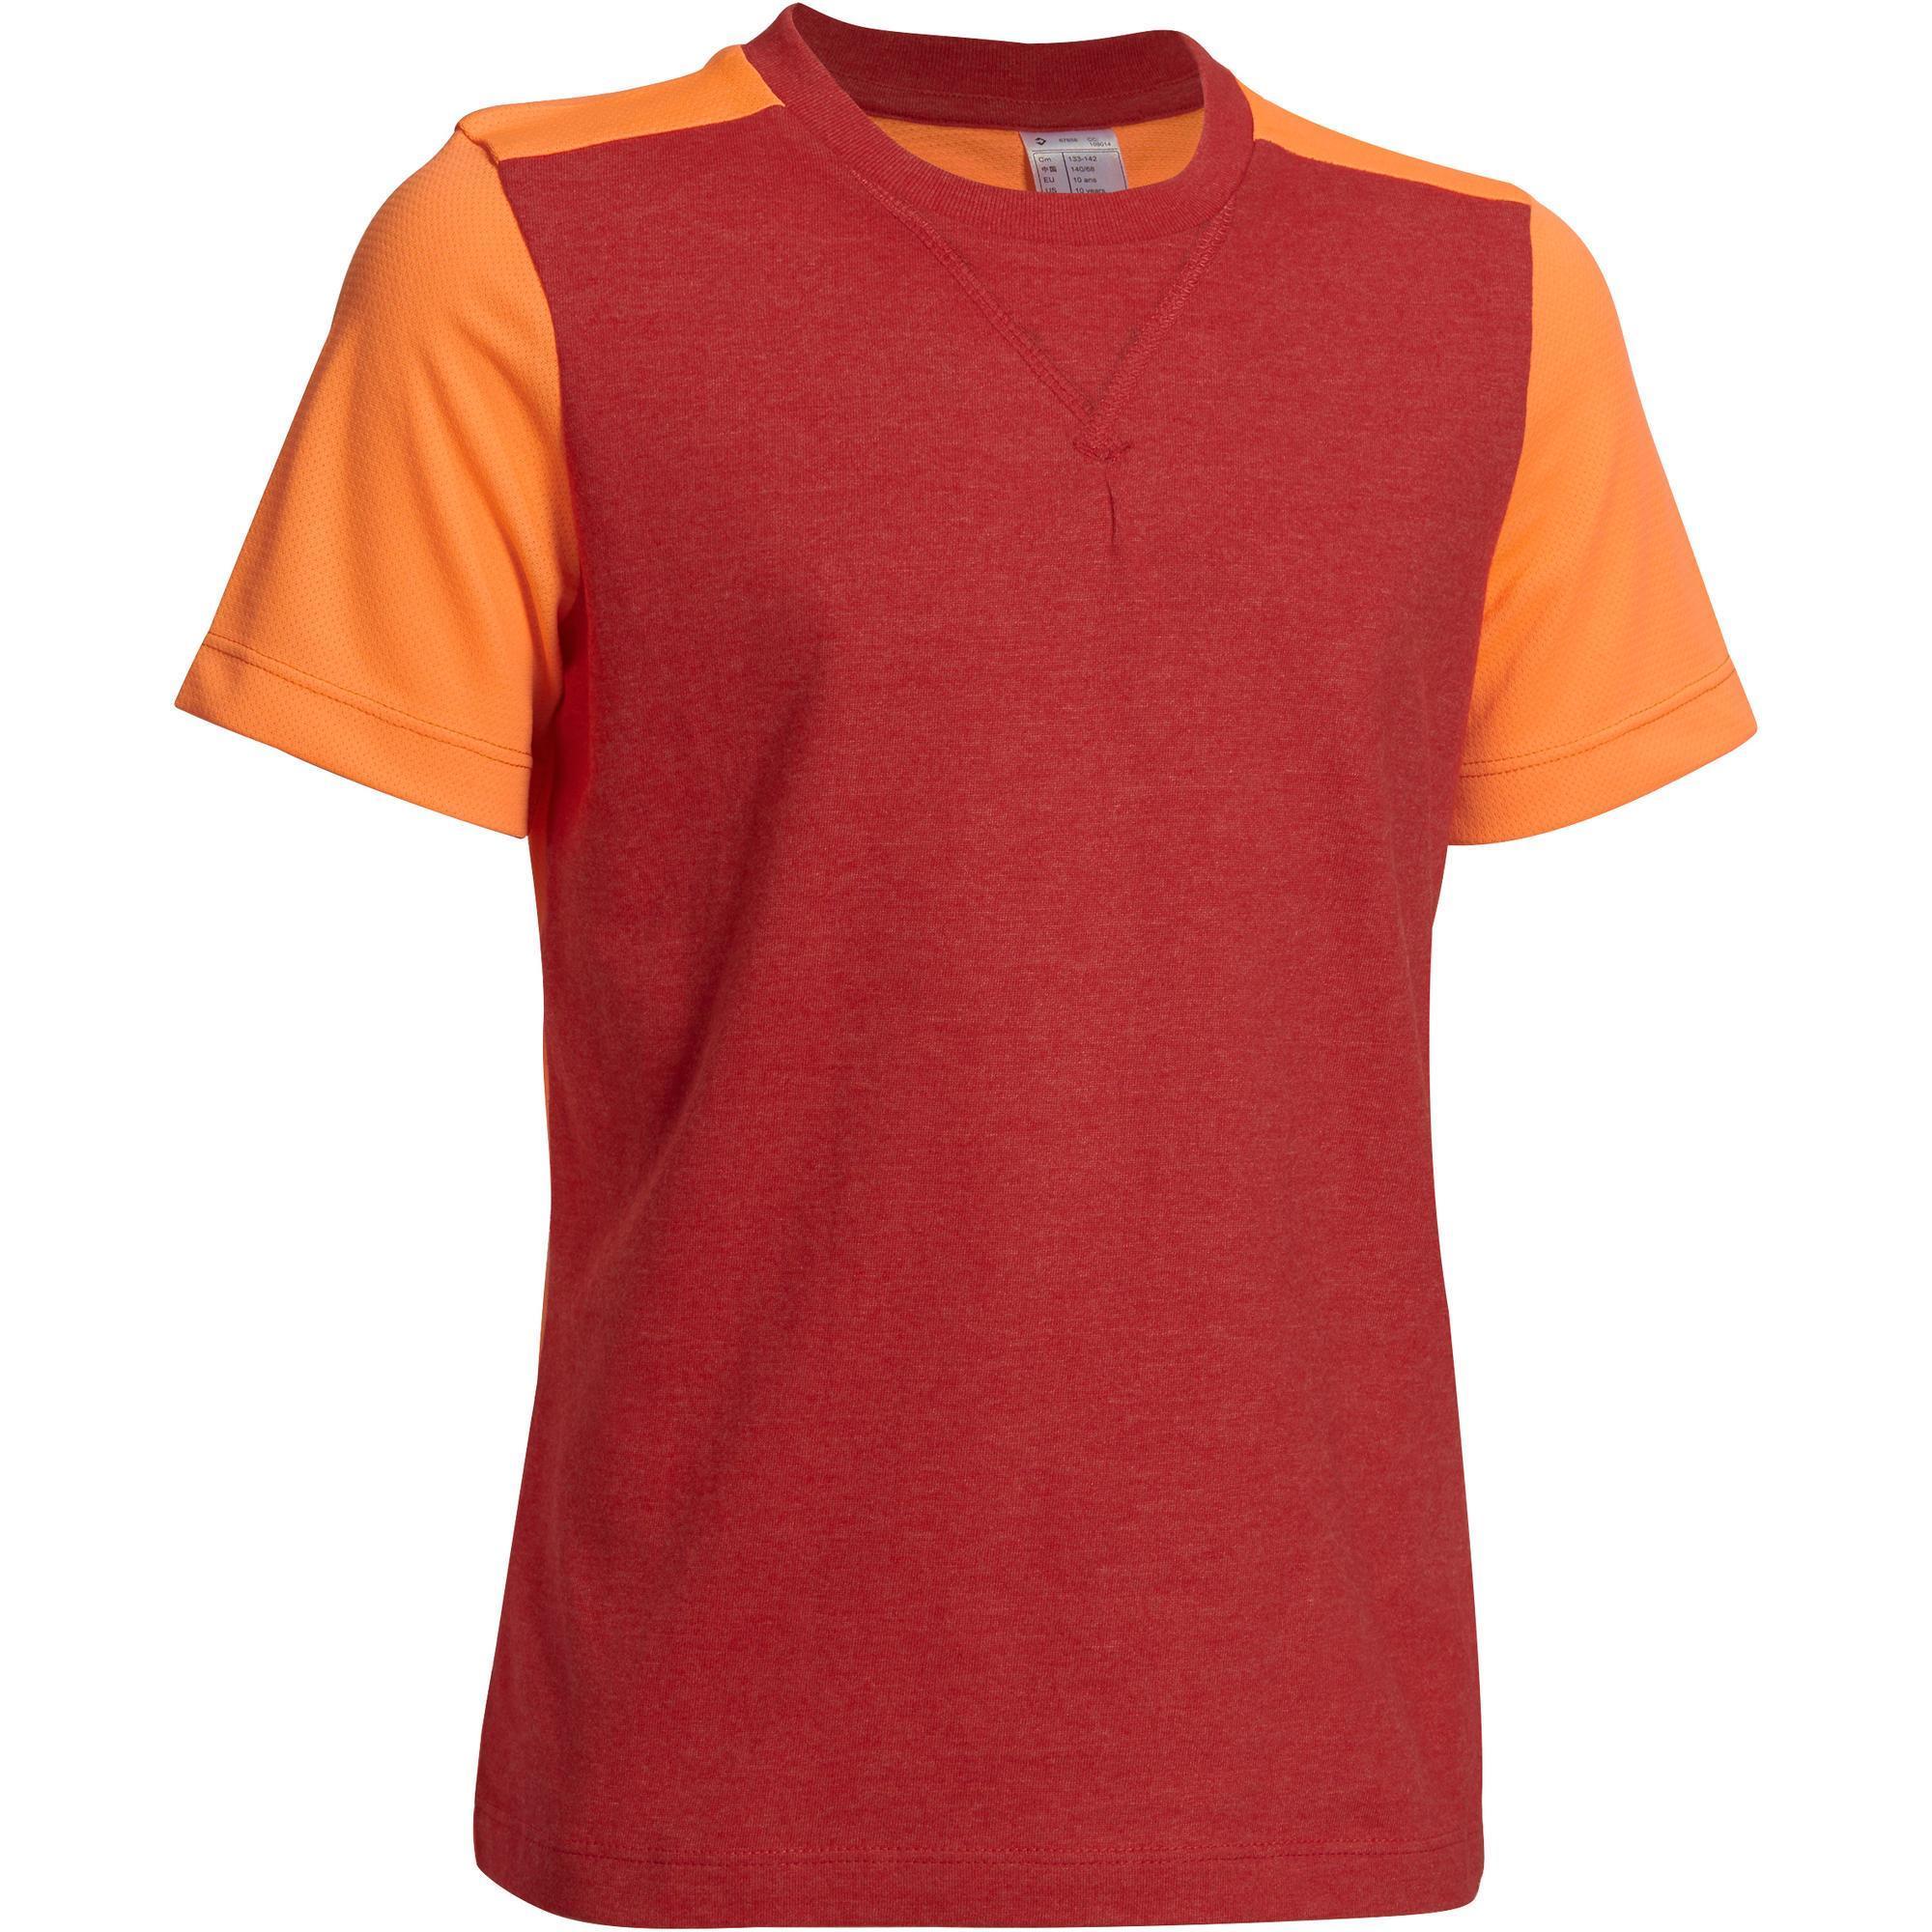 Boys 39 Short Sleeved Gym T Shirt Red Orange Domyos By